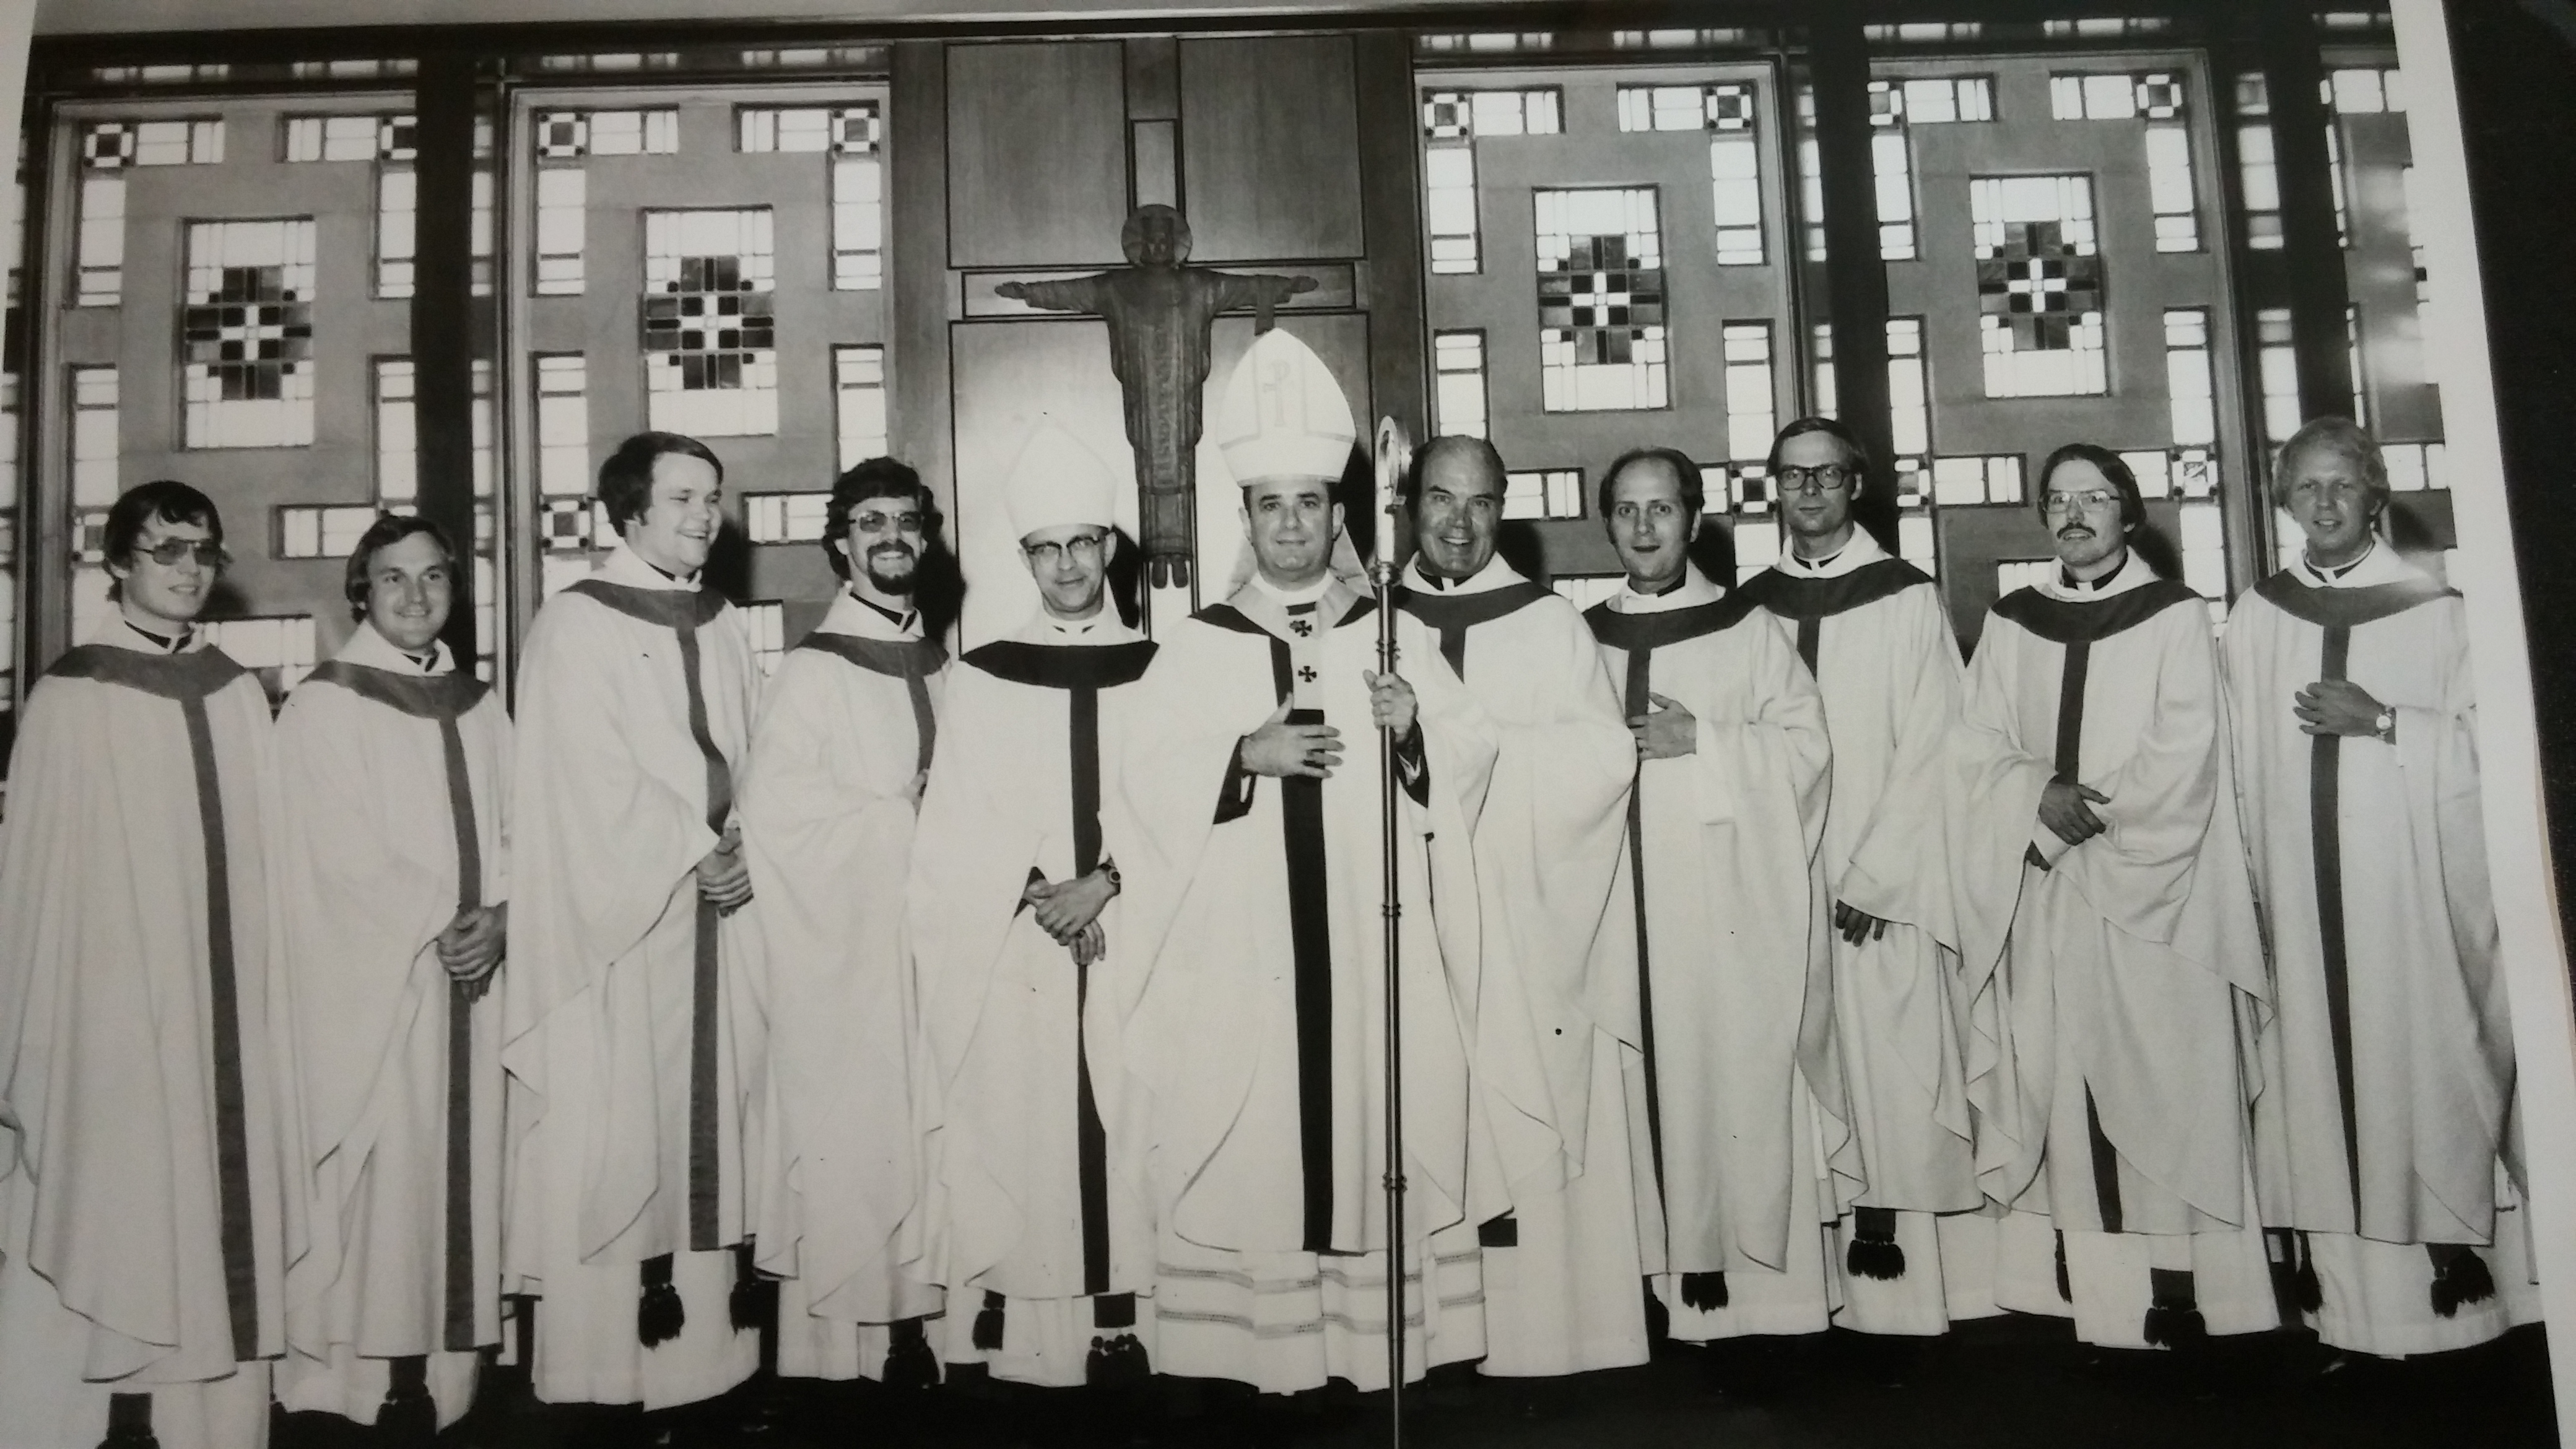 1976 Ordination (from l to r) Fathers Hans Gruenbauer, George Cooley, John Krumm, Carl Bach, Bishop Pilarczyk, Archbishop Bernardin, Father Favret, Fathers David Garrick, Thomas Feldhaus, Thomas Grilliot, Thomas Snodgrass